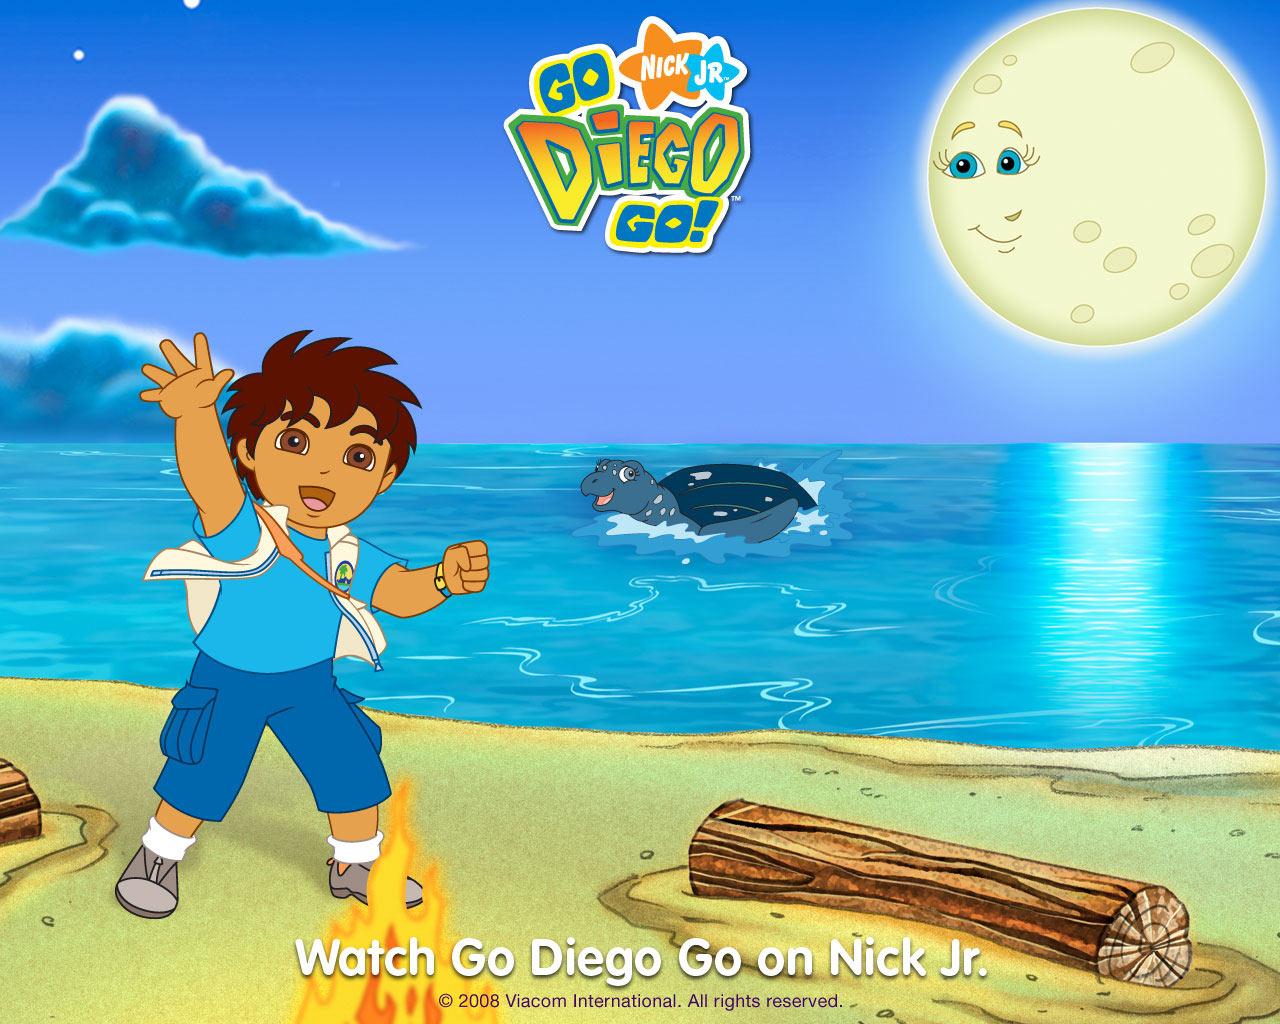 pictures   computer Go Diego Go wallpaper   Go Diego Go Wallpaper 1280x1024